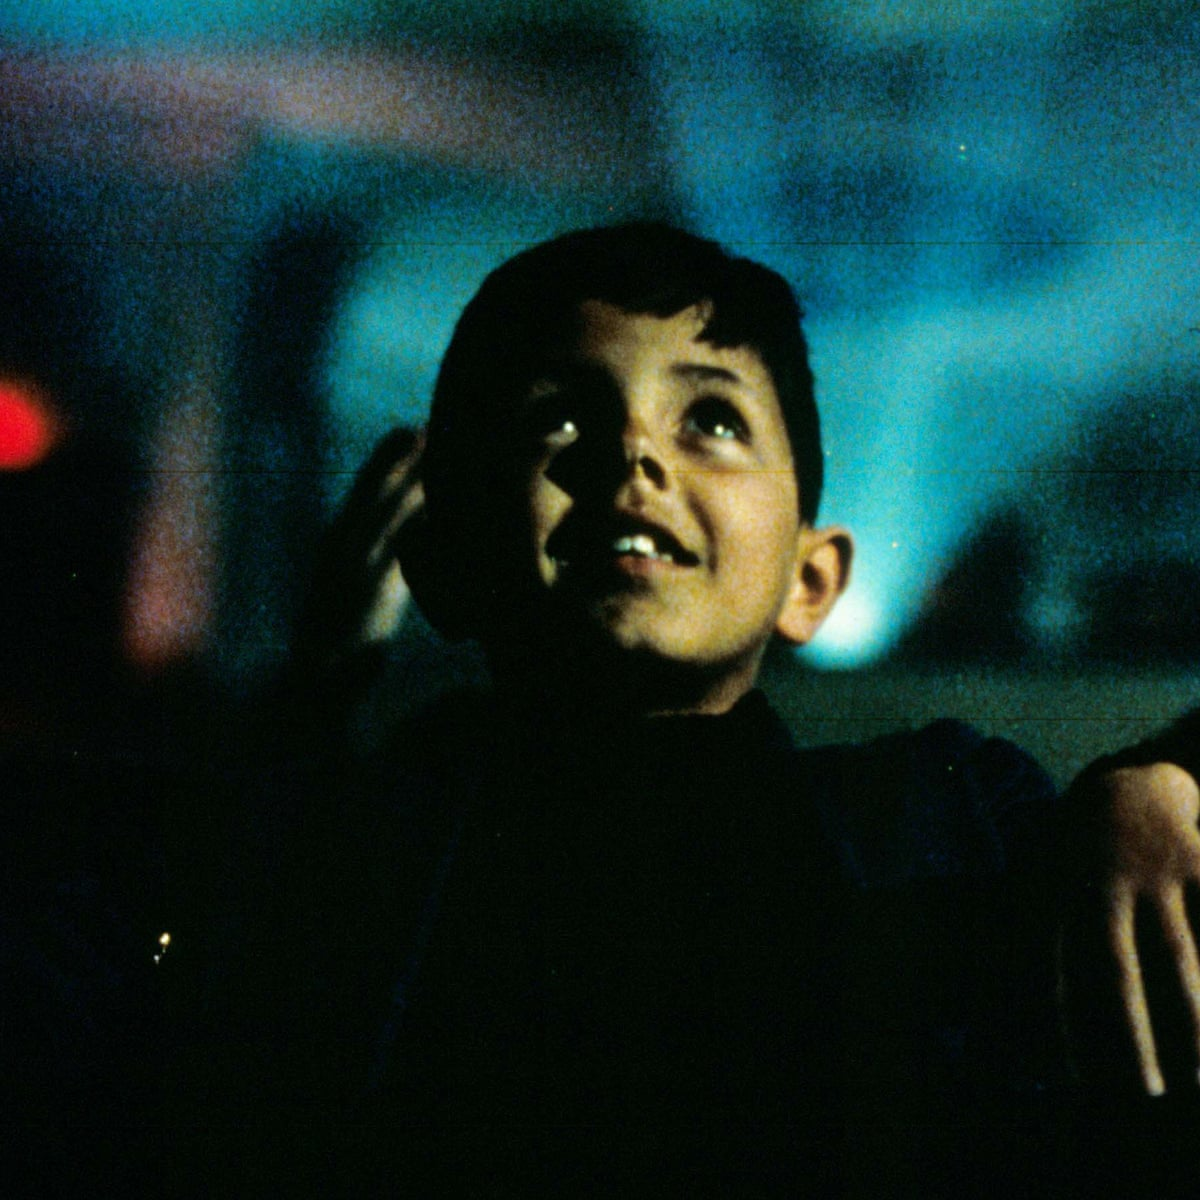 Fig. 4: 'That childhood excitement has stayed with me': Salvatore Di Vita (Salvatore Cascio) in Cinema Paradiso (1988)